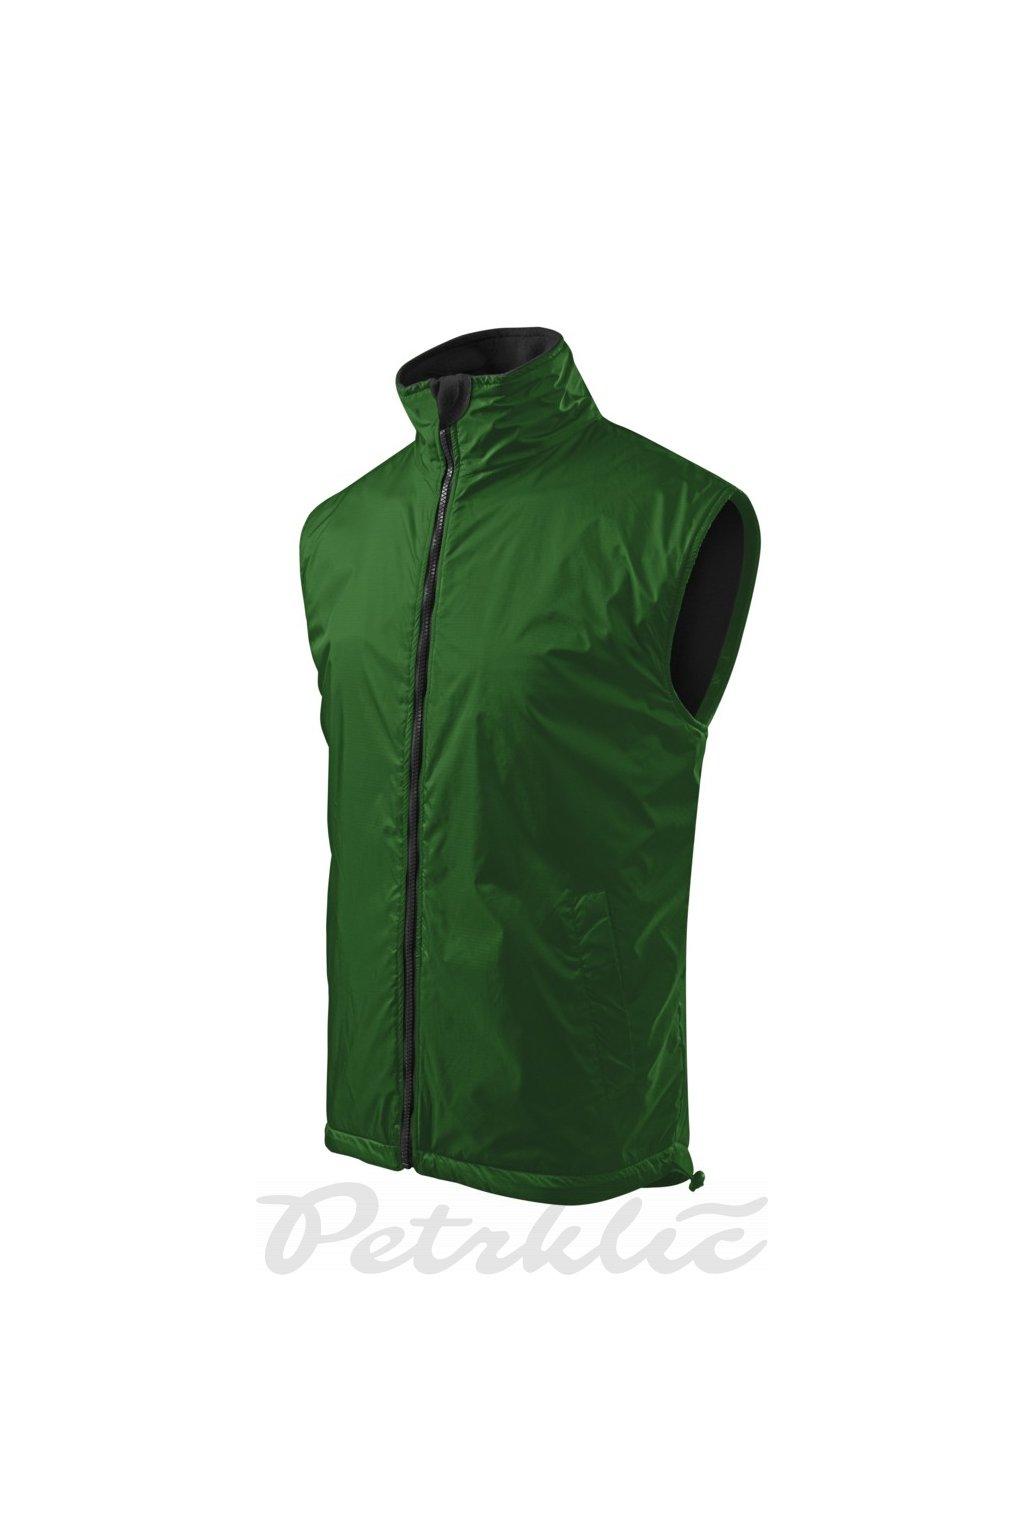 Vesta body warmer 509 zelená